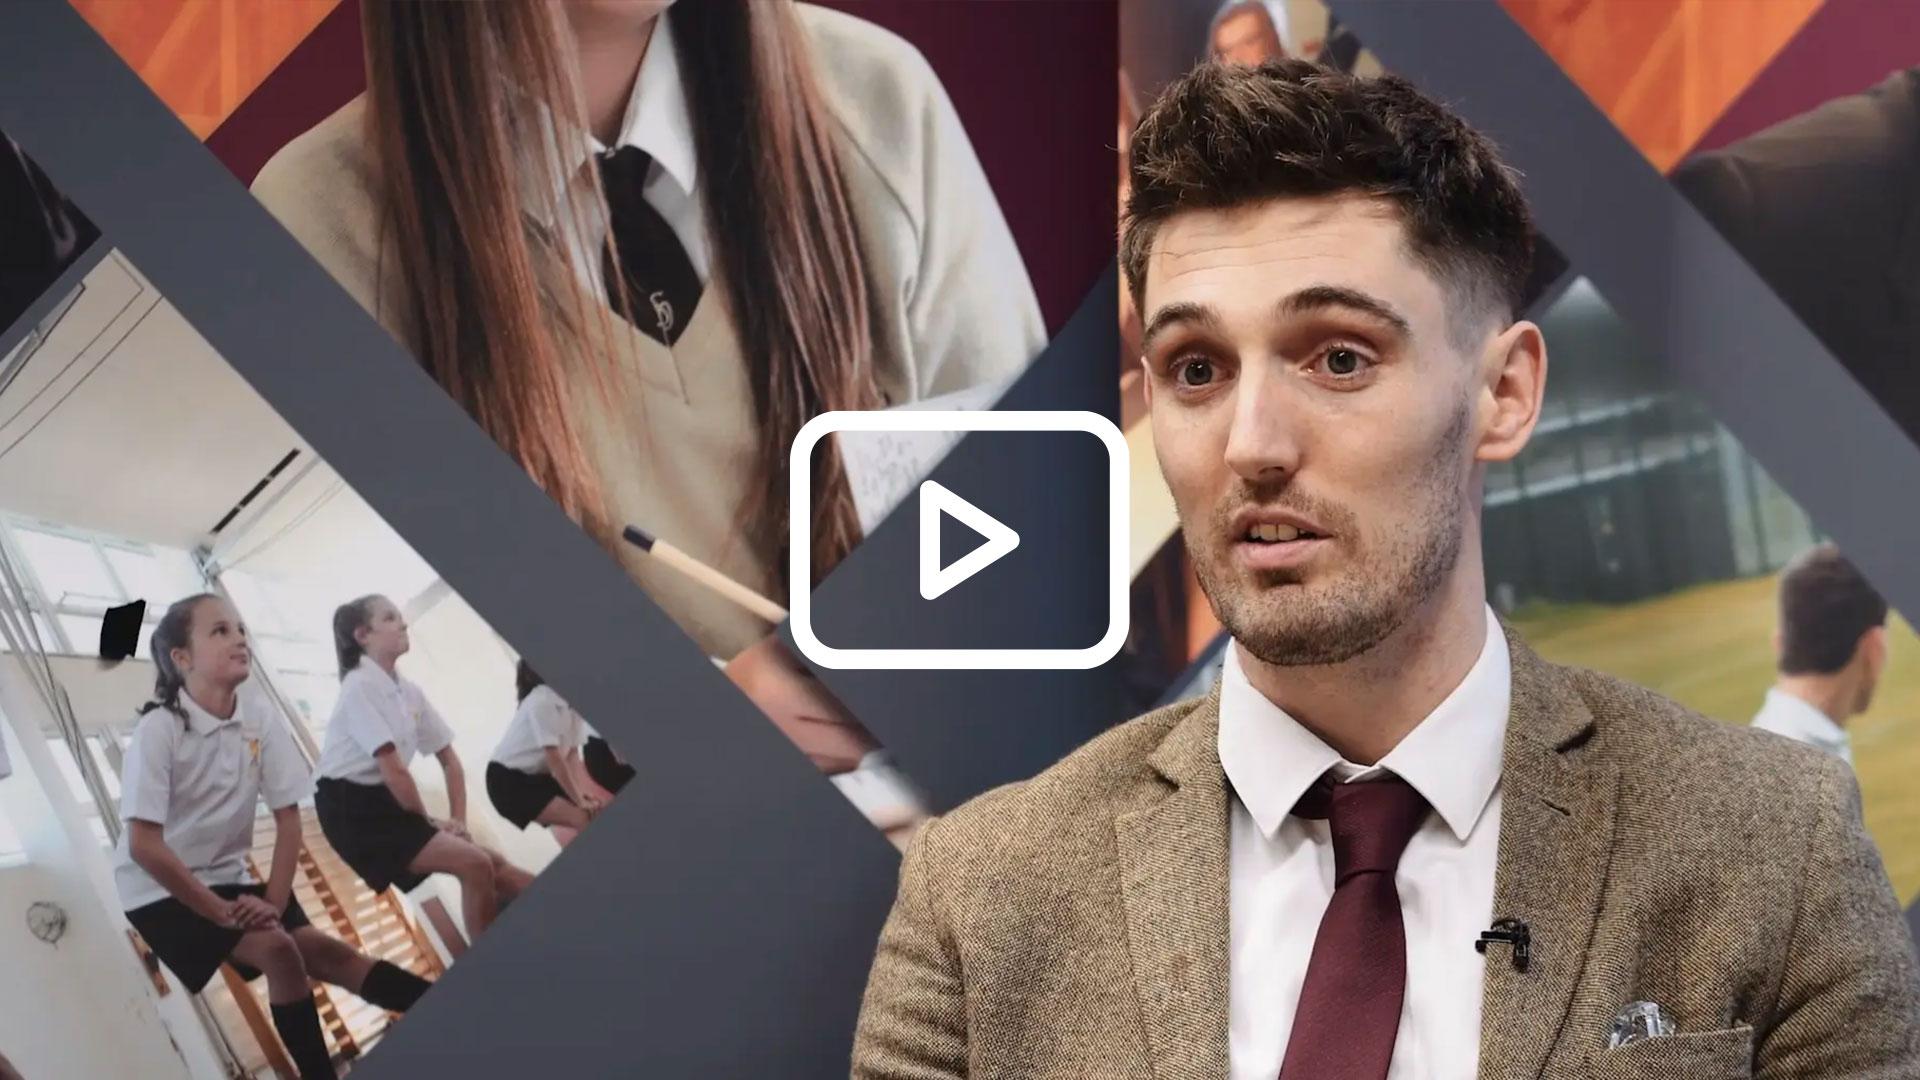 Video: Daniel's Story